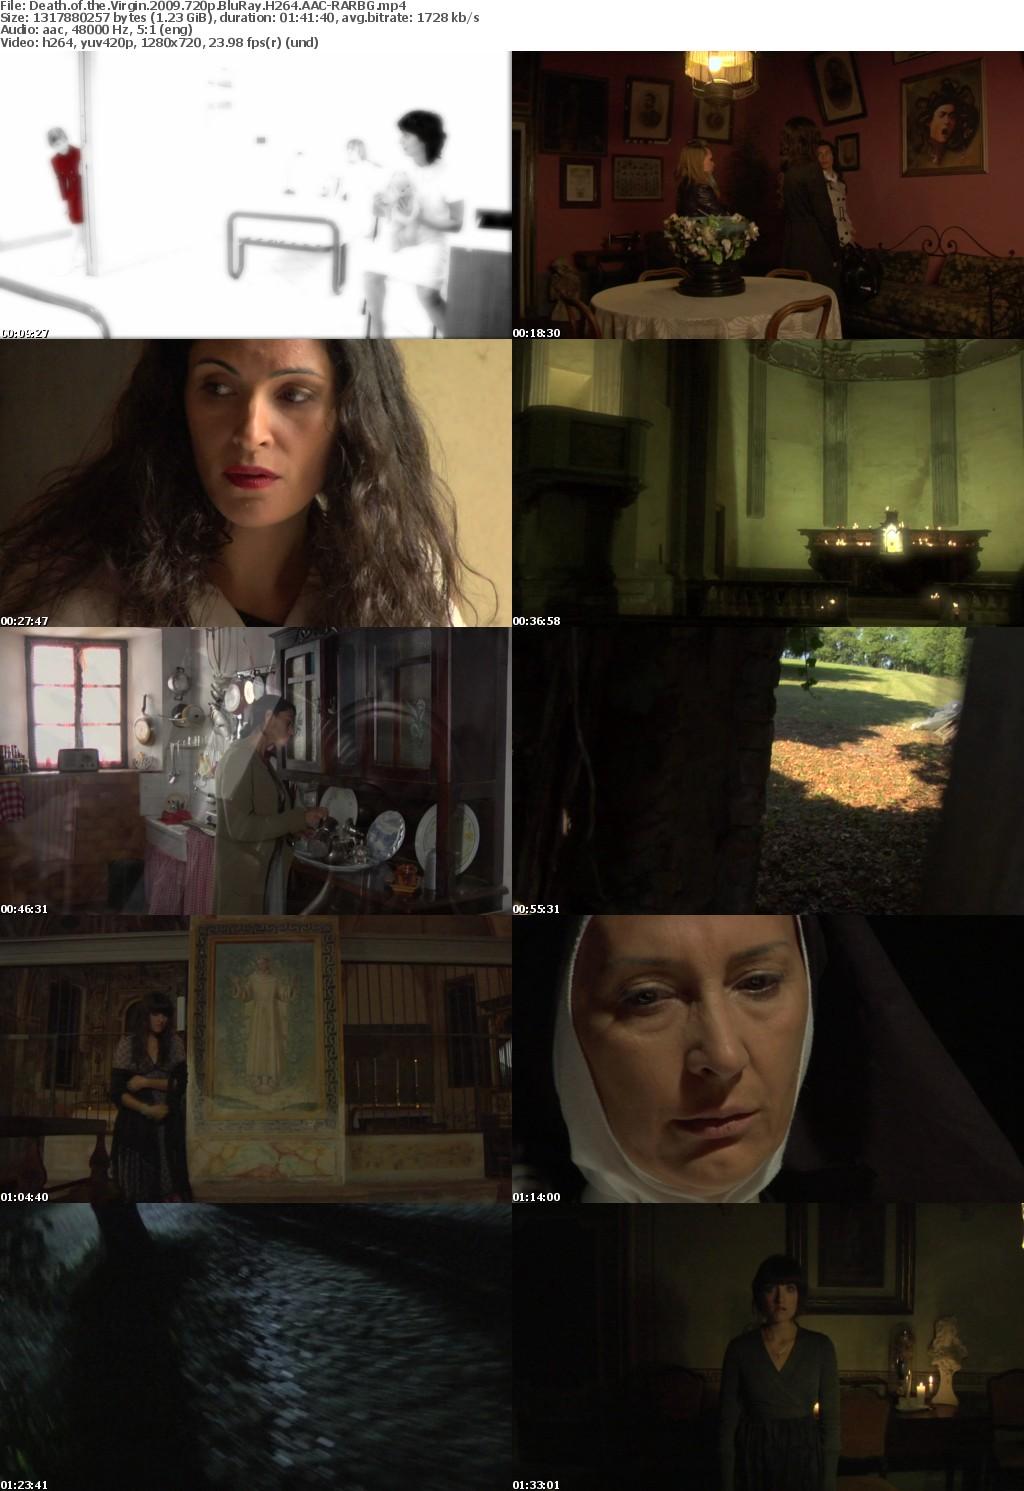 Death of the Virgin (2009) 720p BluRay H264 AAC-RARBG